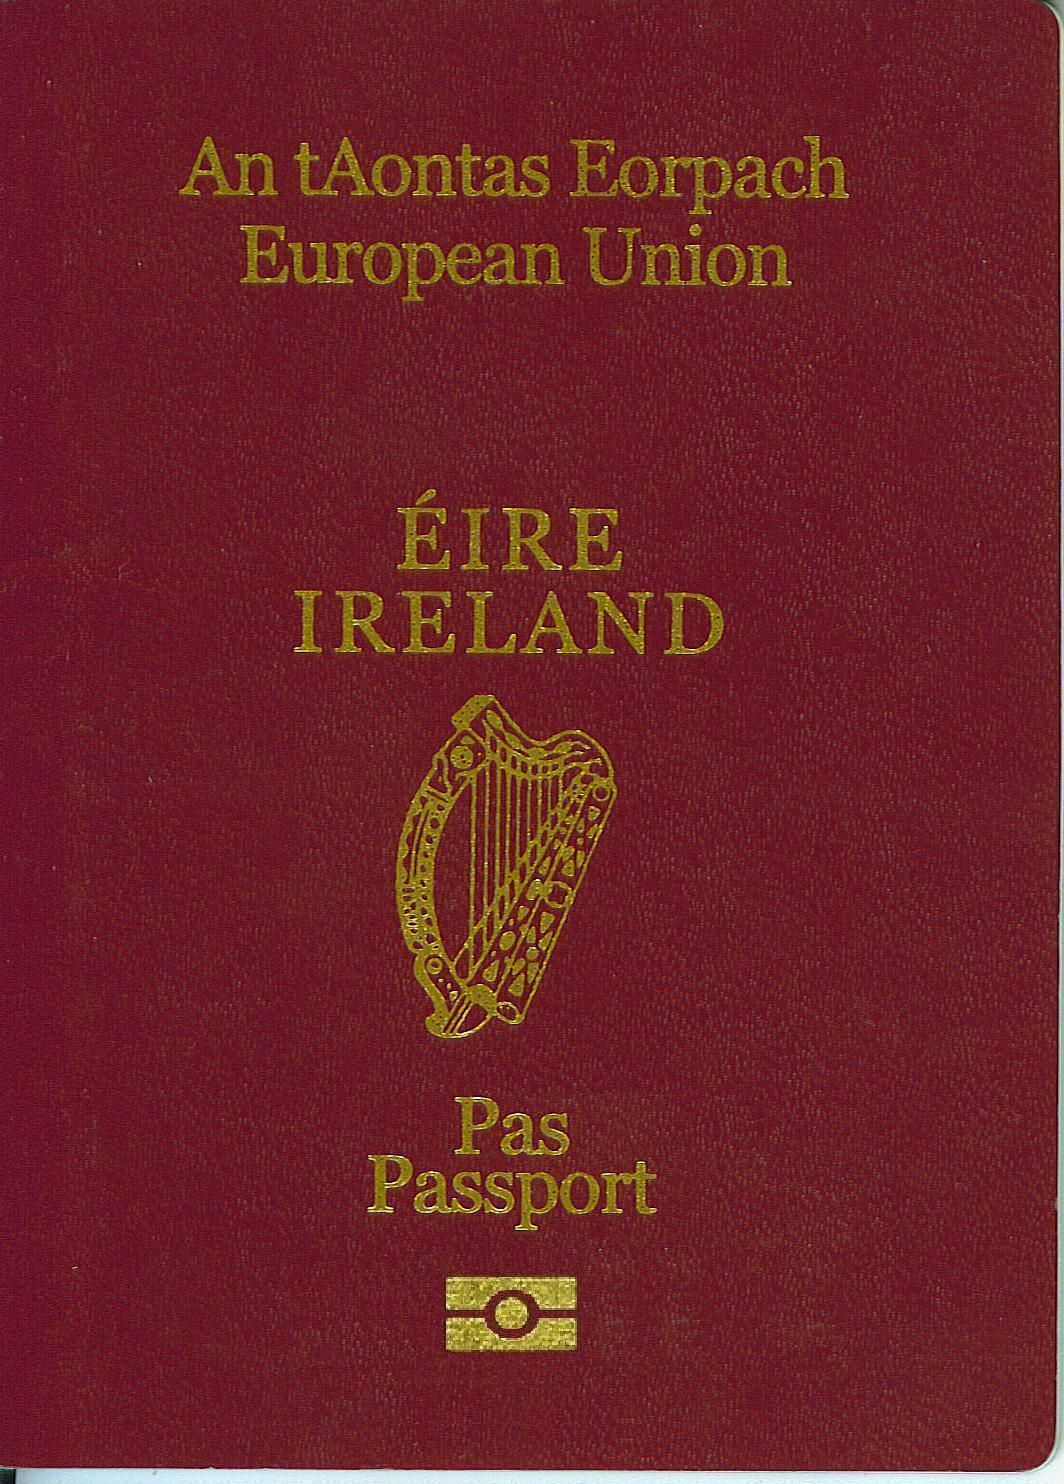 Https Prodocuments Cc Apply For Passport Online Genuine